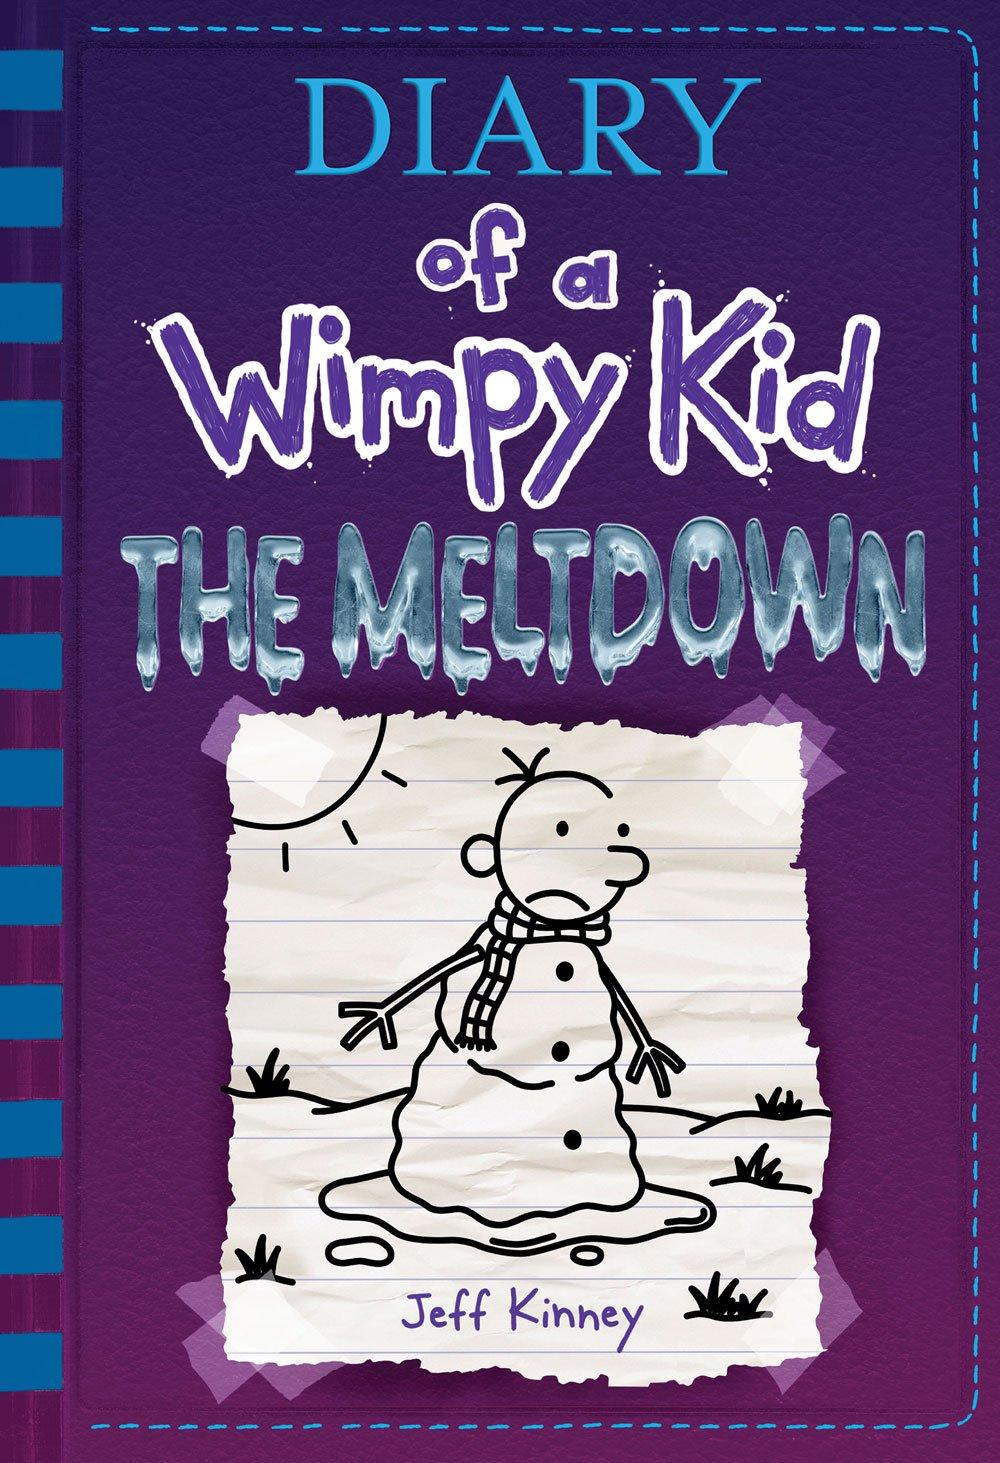 Diary Of A Wimpy Kid 13 Meltdown Jeff Kinney 9781419727436